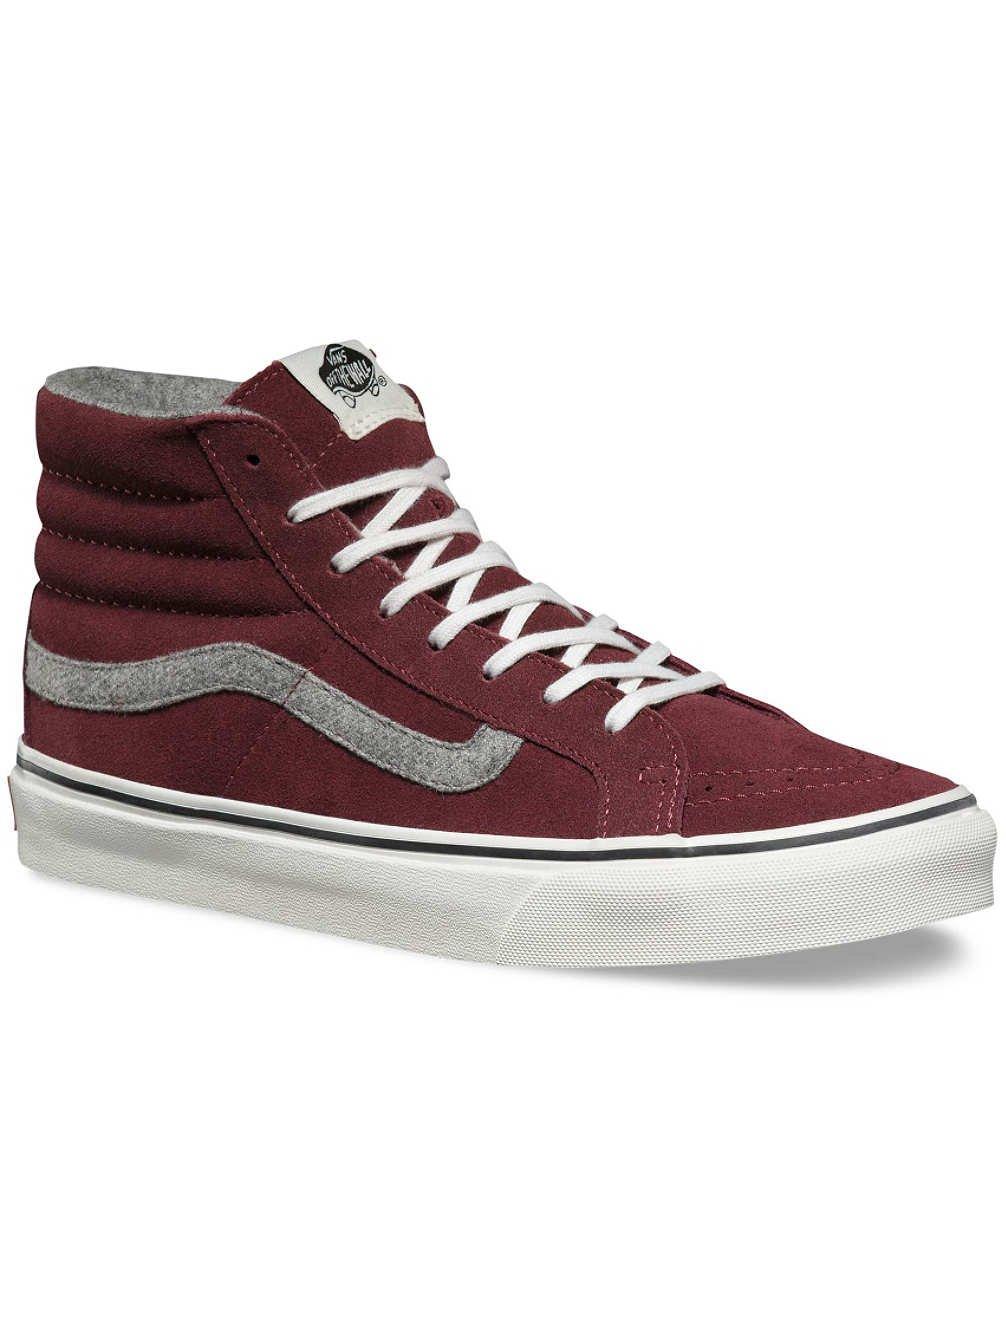 f6b6577e09946c Galleon - Vans Unisex SK8-Hi Slim Sneaker Red Mahogany Vintage Suede